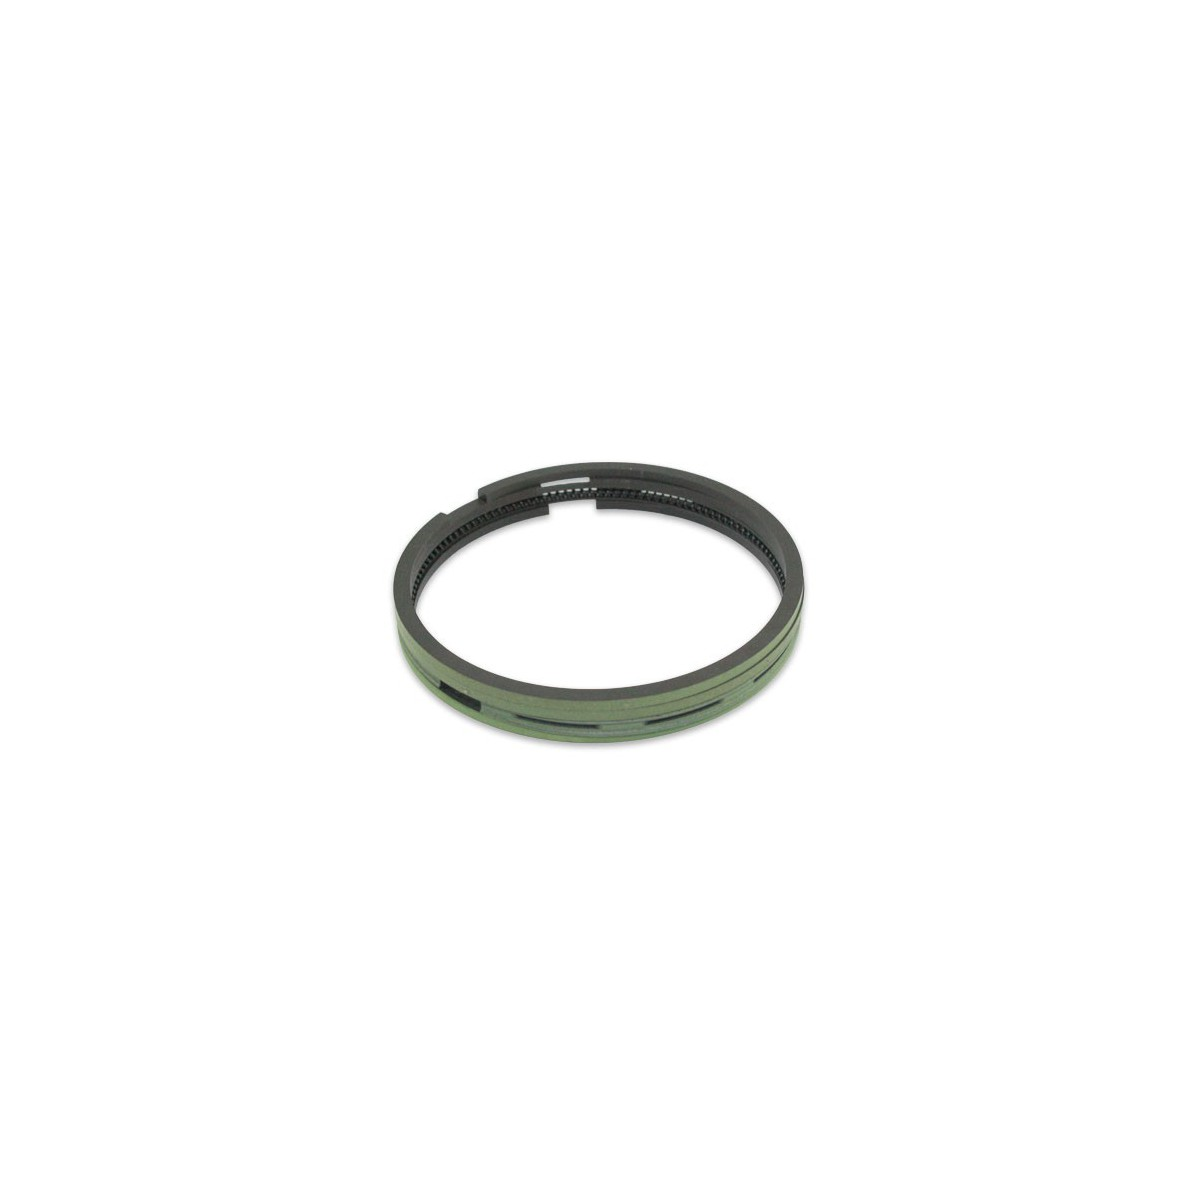 Kolbenringsatz Yanmar YM2210 724763-22500 90 2,5 x 2,5 x 2,5 x 4 STD